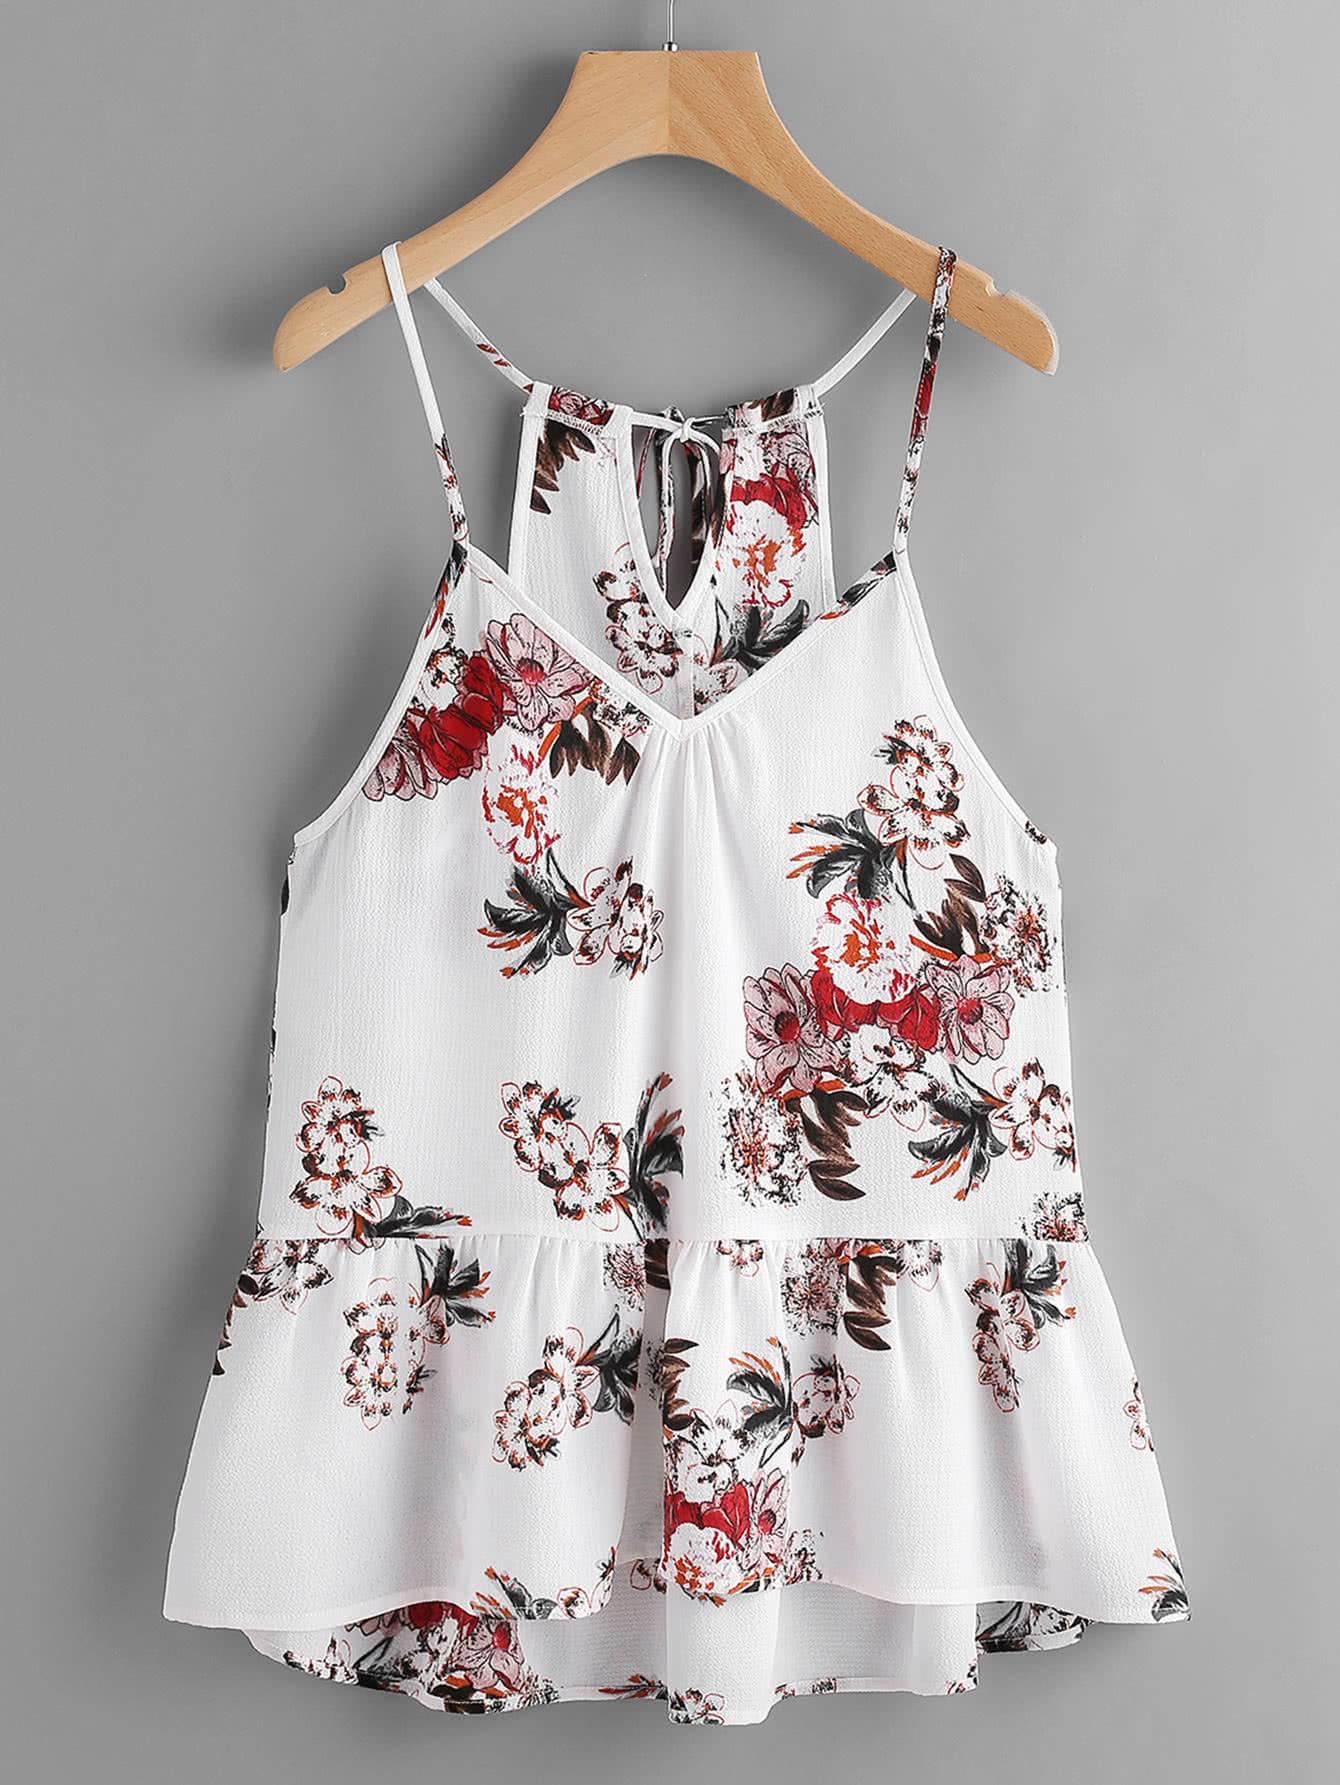 Flower Print Keyhole Self Tie Back Peplum Cami Top vest170530701